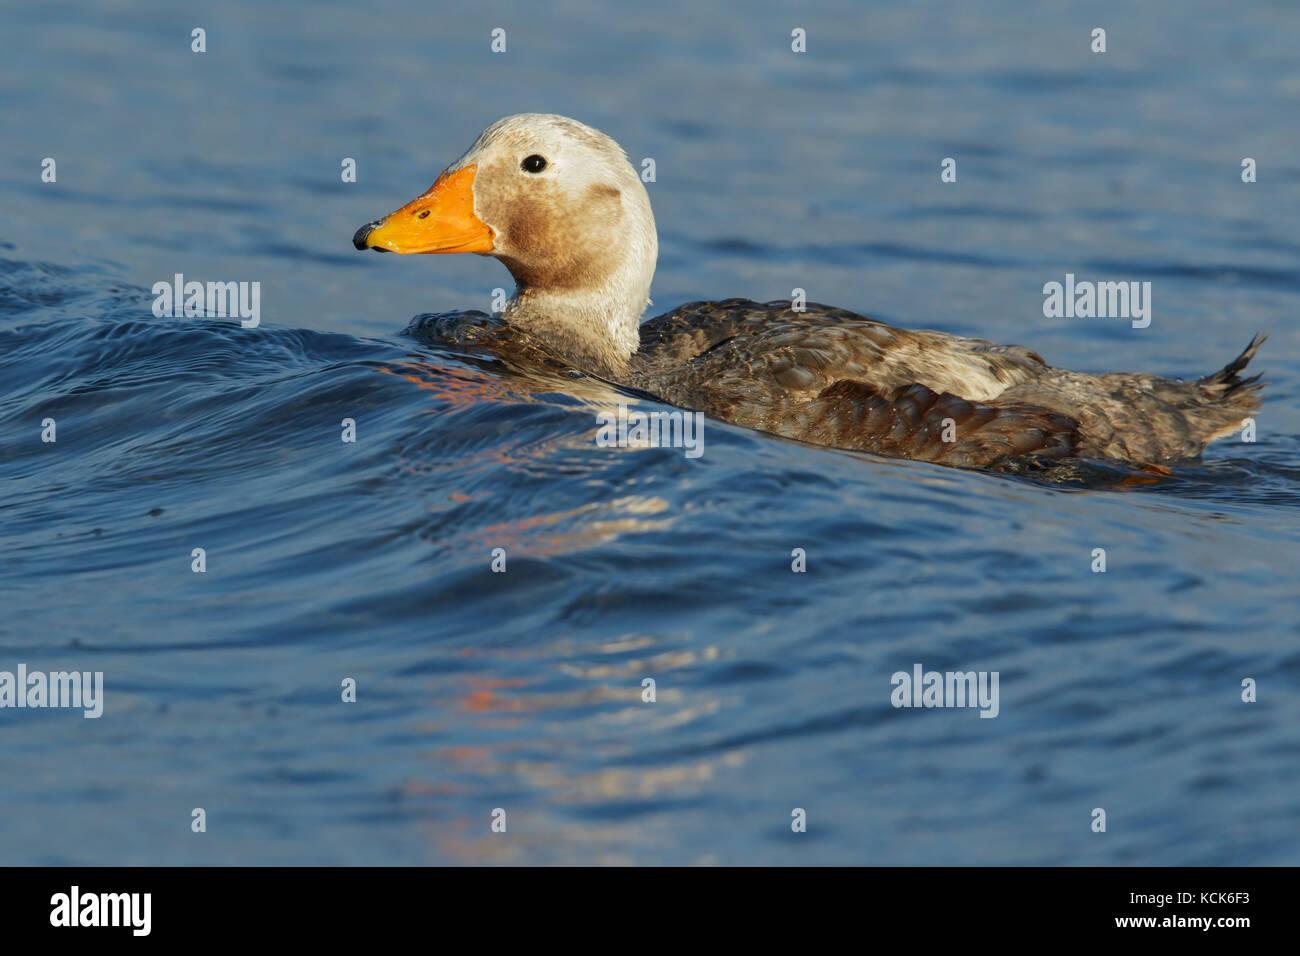 Falkland (Flightless) Steamer-Duck (Tachyeres brachypterus) swimming in the ocean in the Falkland Islands. - Stock Image